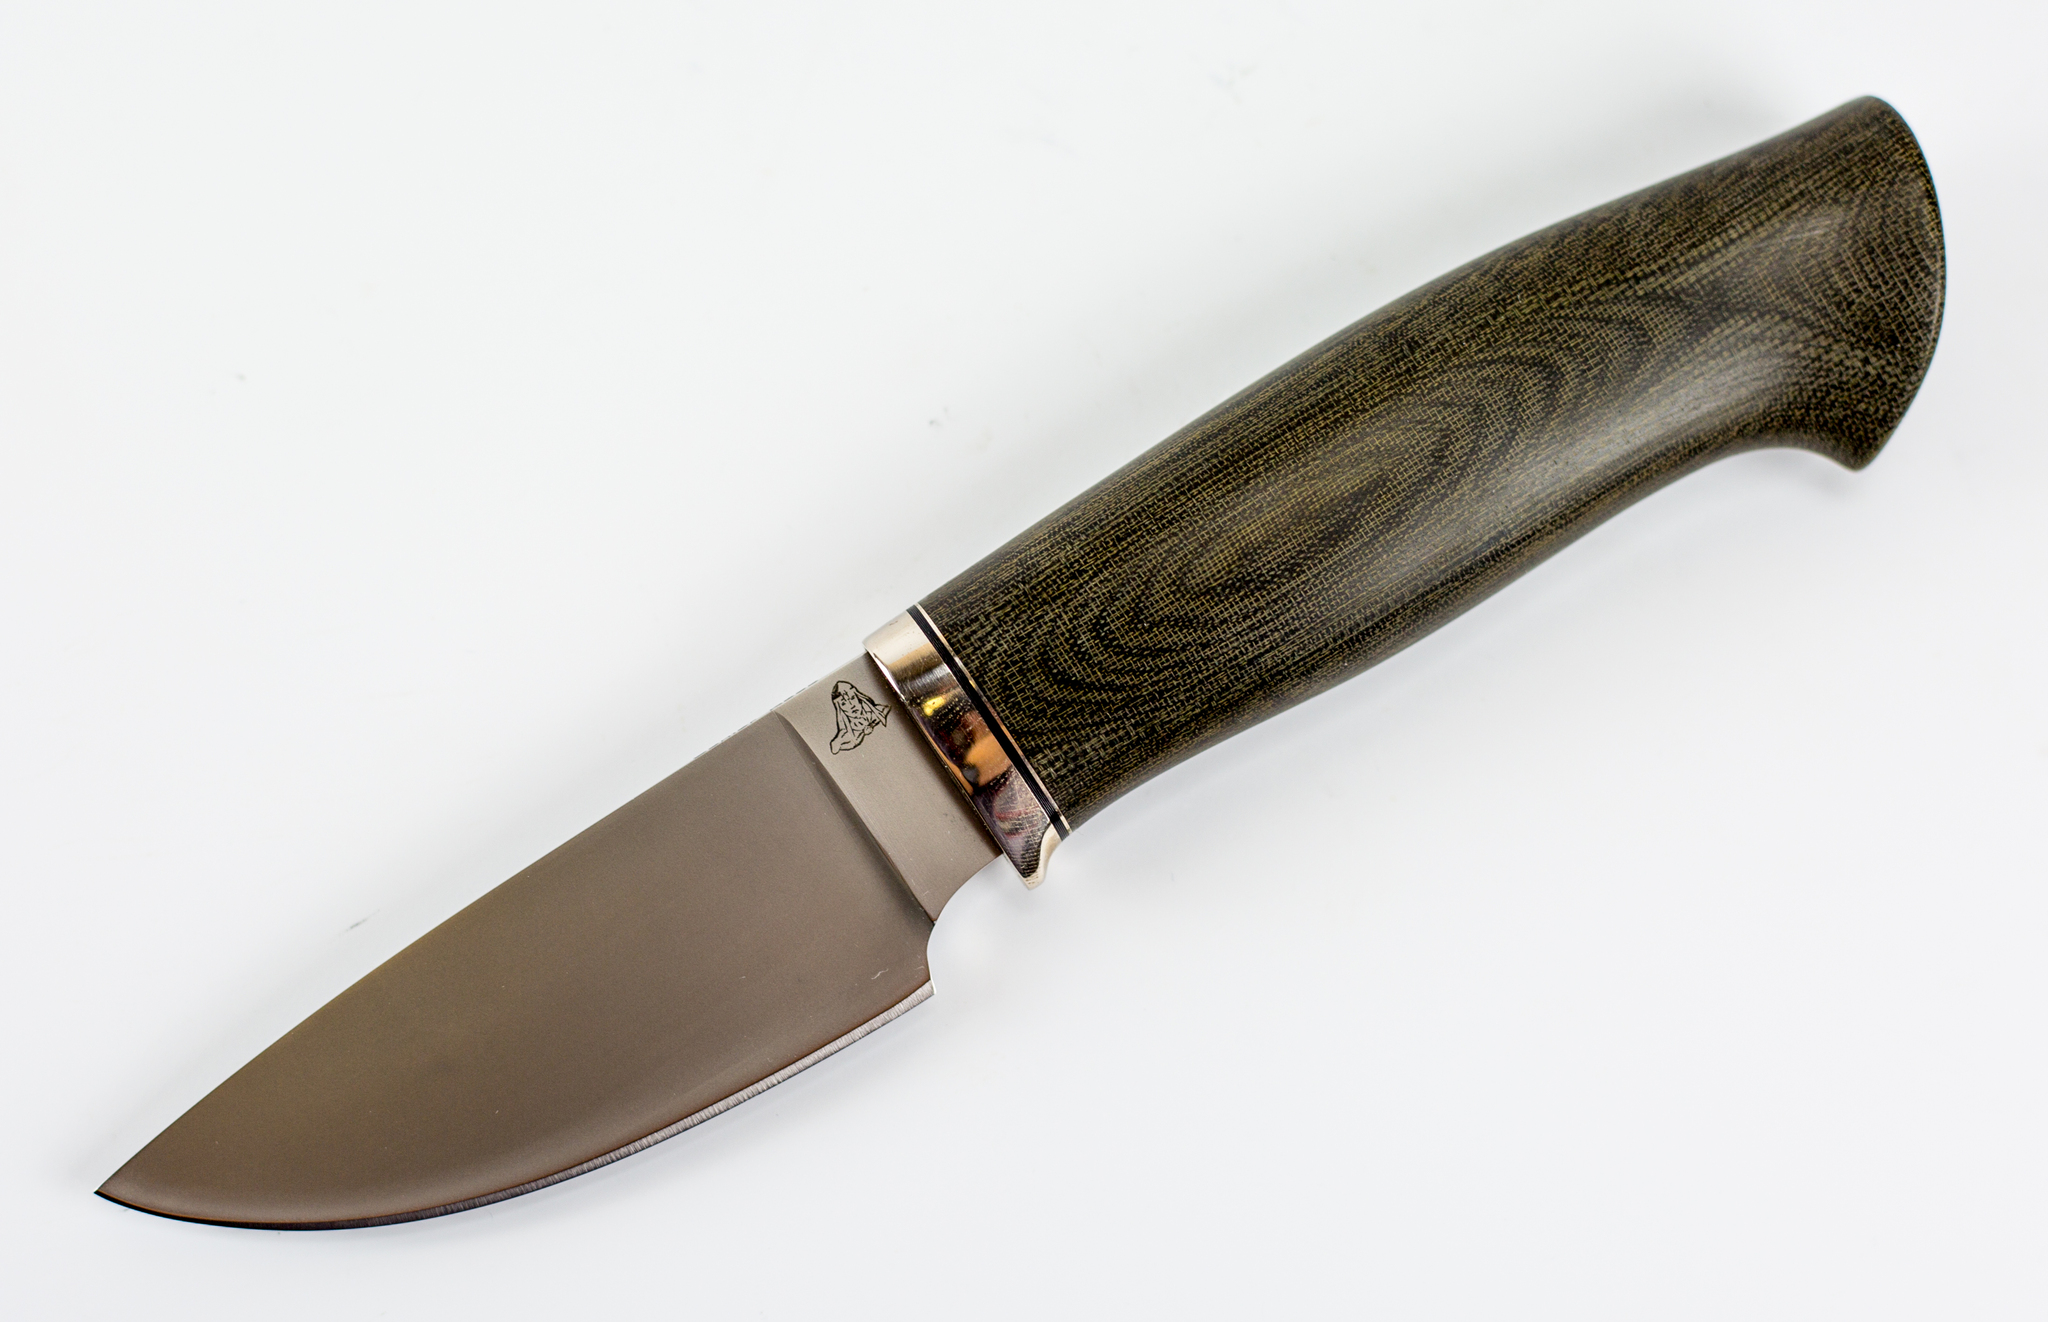 Нож Вороненок, К390, микарта, мельхиорНожи Ворсма<br>Нож Кроха<br>